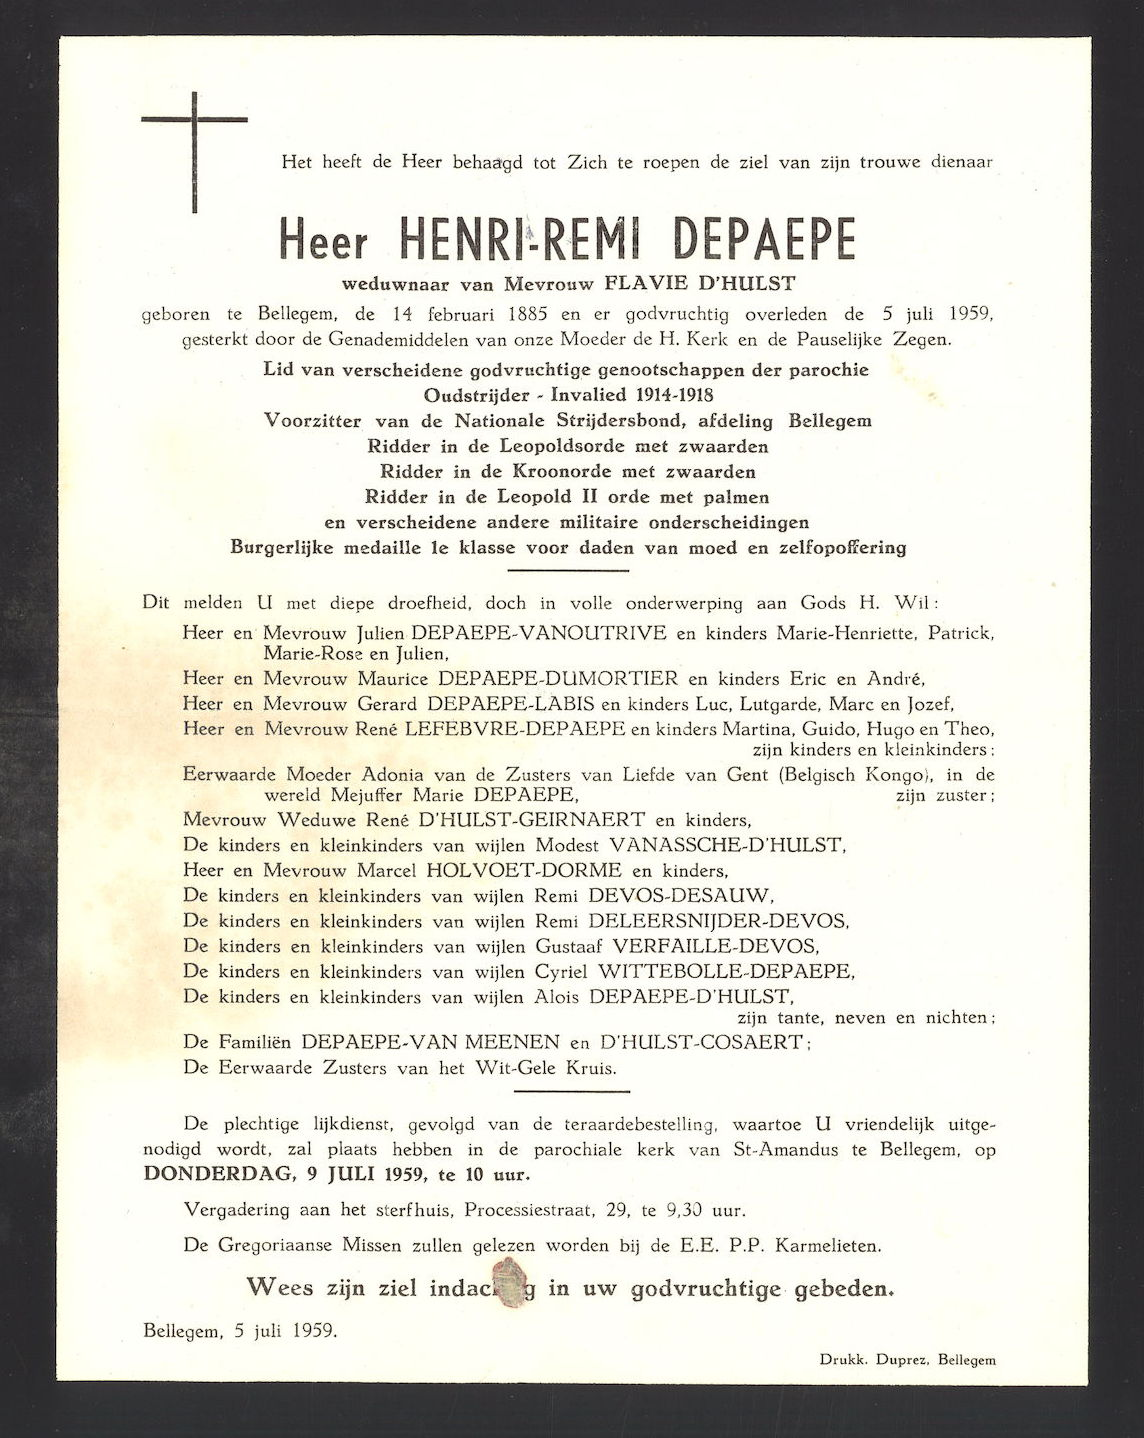 Henri-Remi Depaepe